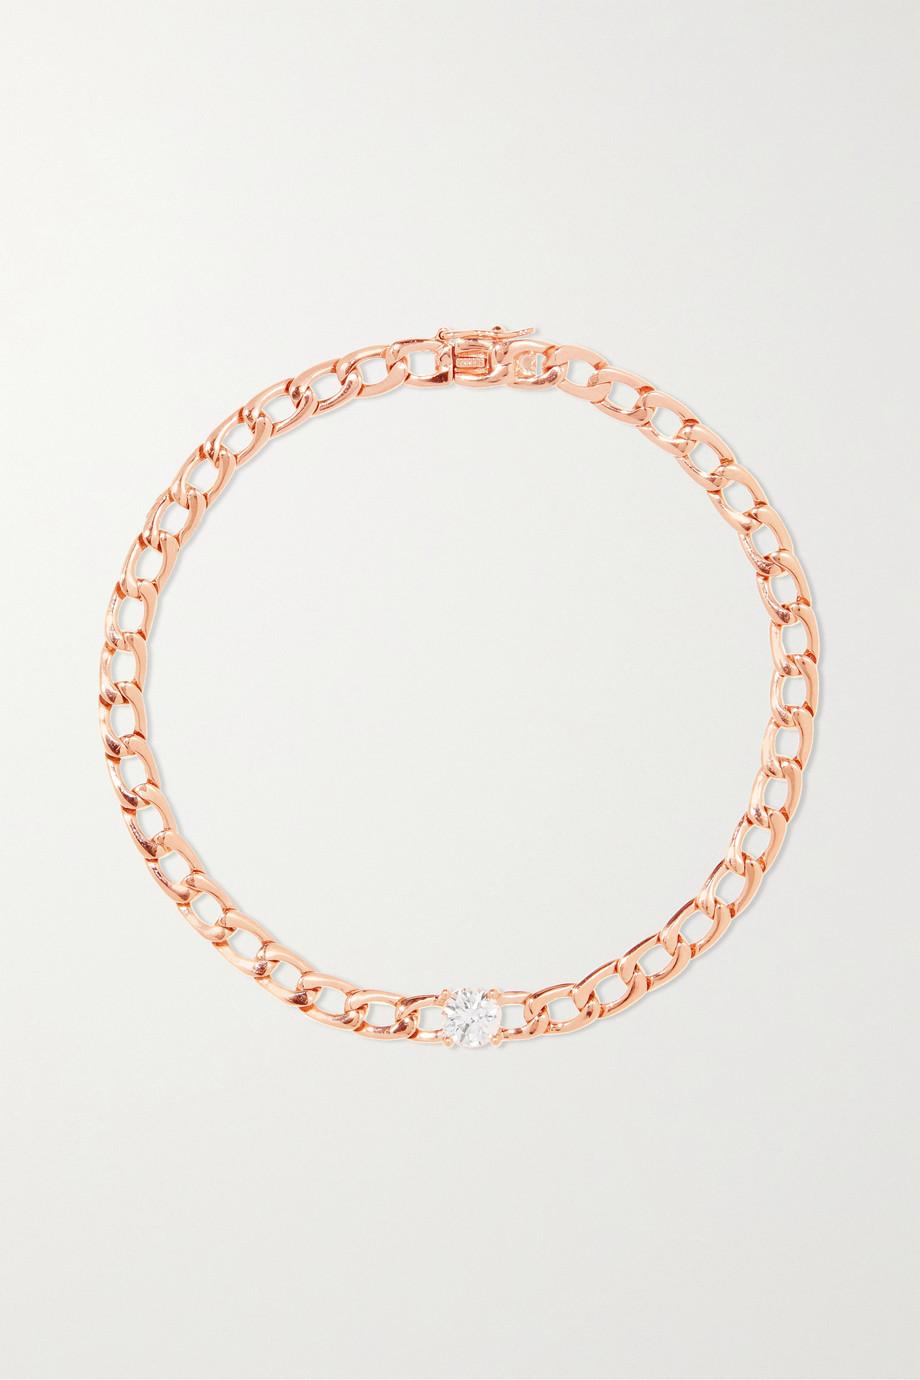 Anita Ko Armband aus 18 Karat Roségold mit Diamant